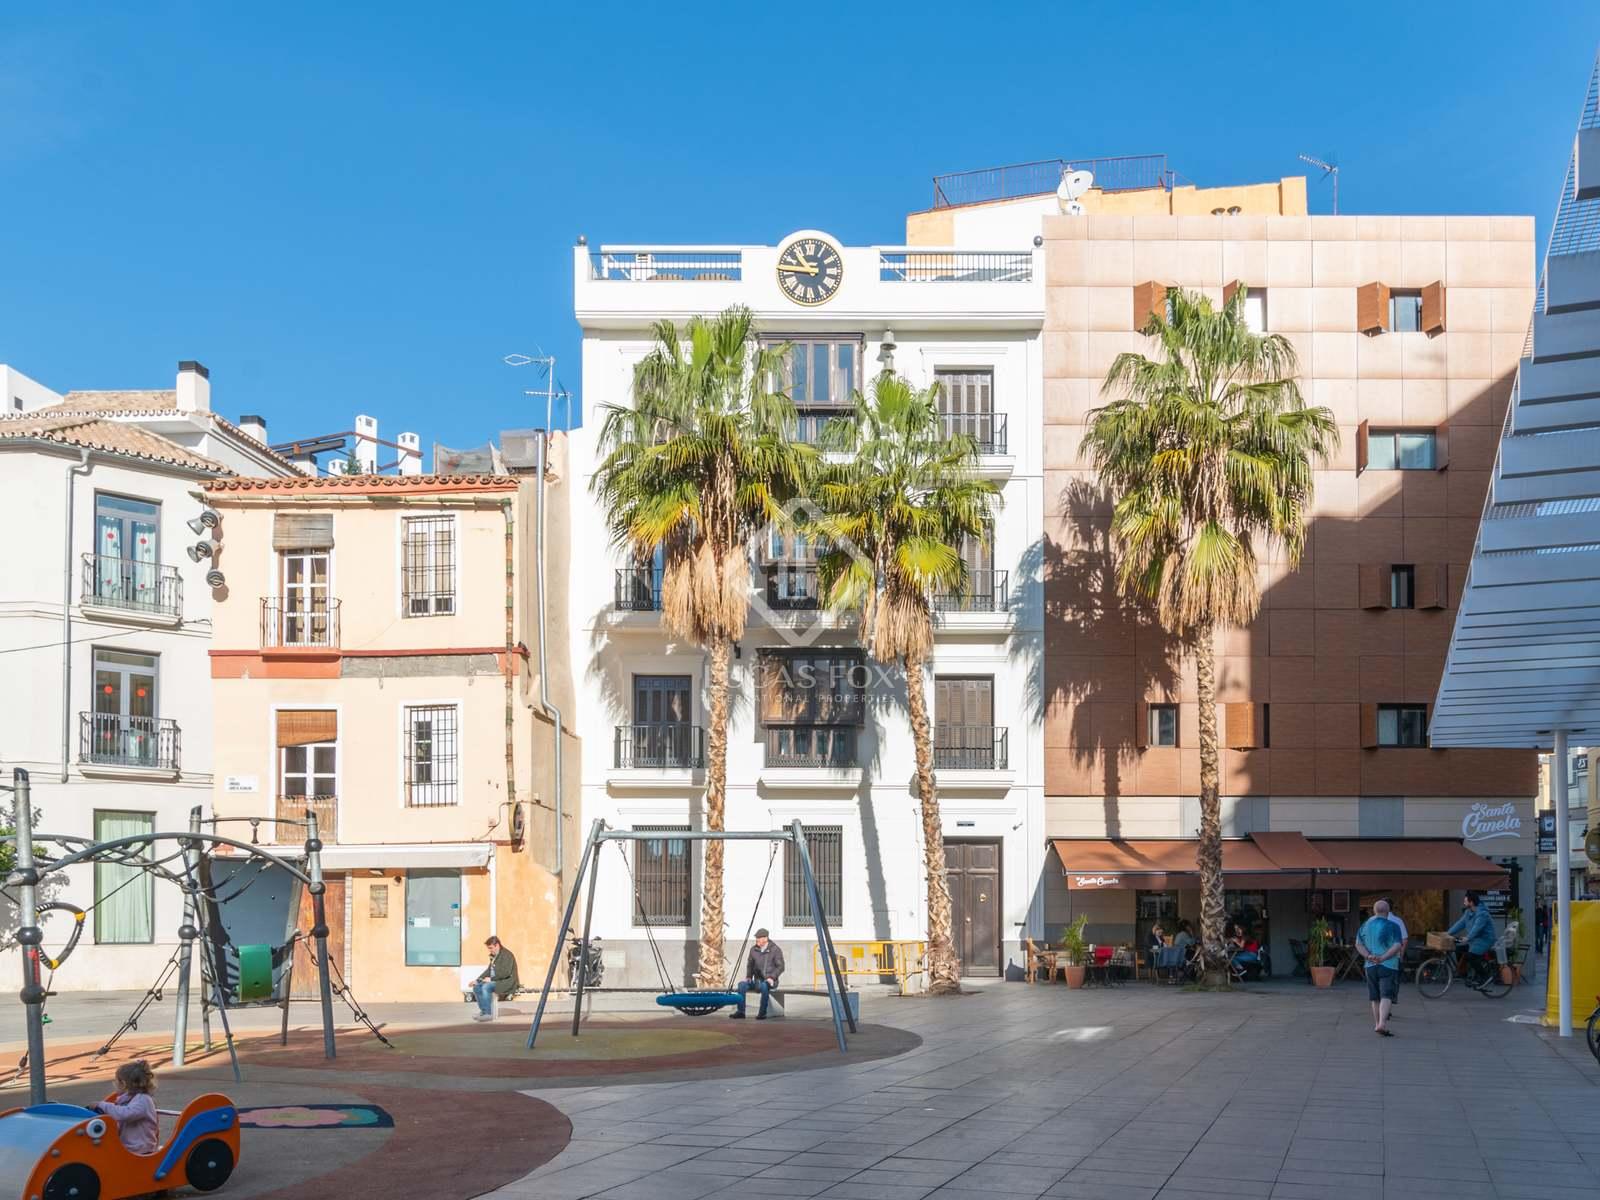 L-1708 Chalet en venta en Málaga